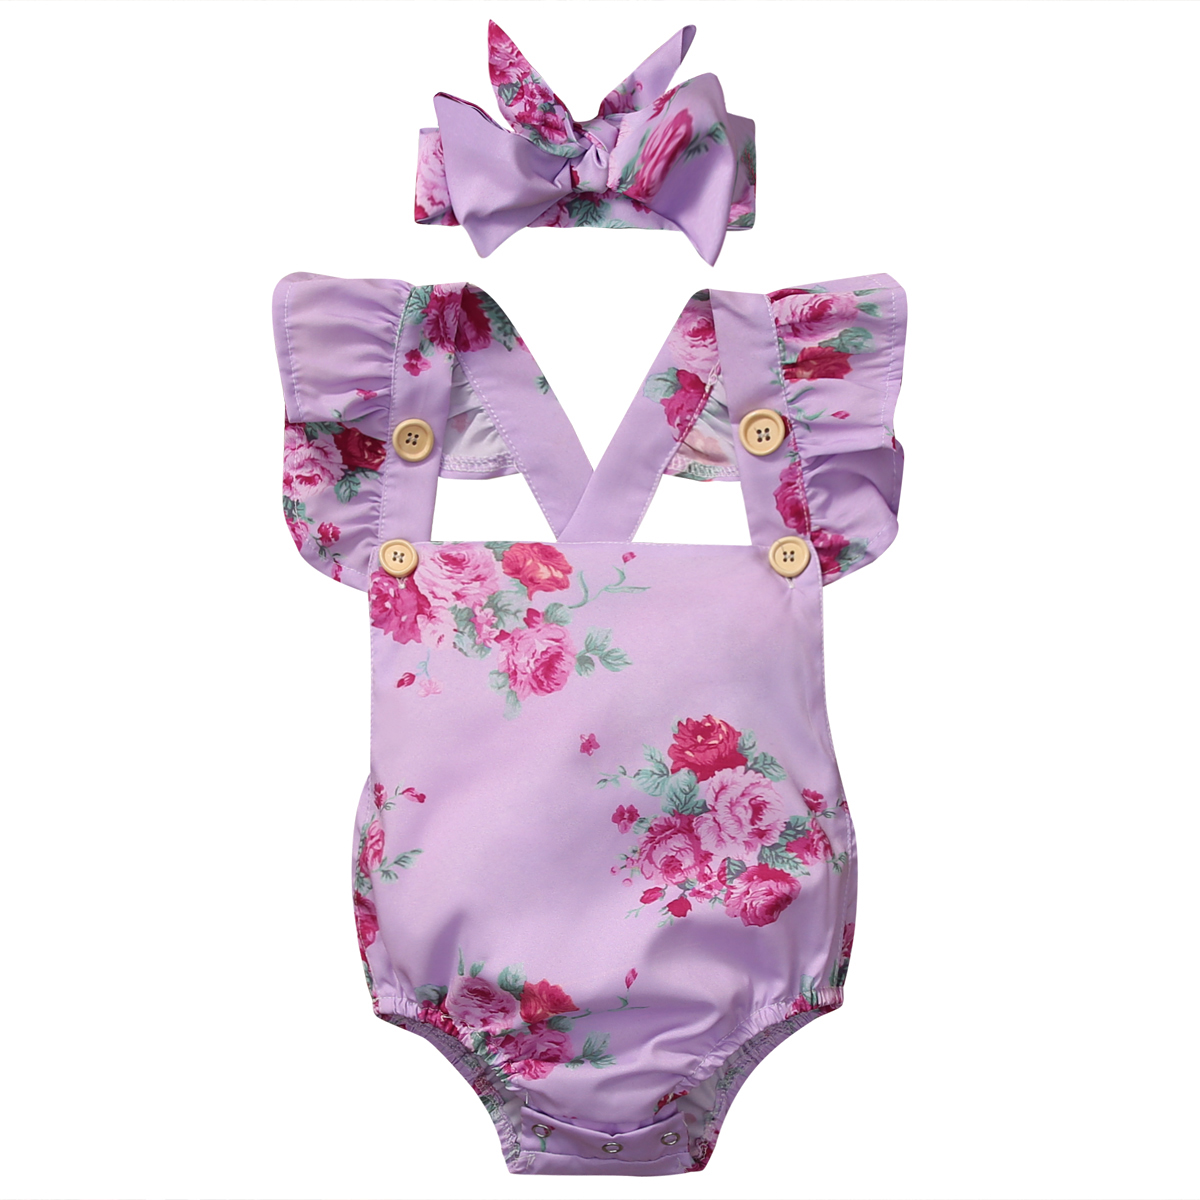 0-24 M Pasgeboren Baby Baby Meisje Paars Bloemen Backless Romper Vlinder Mouwen Jumpsuit Outfits Sunsuit Kleding